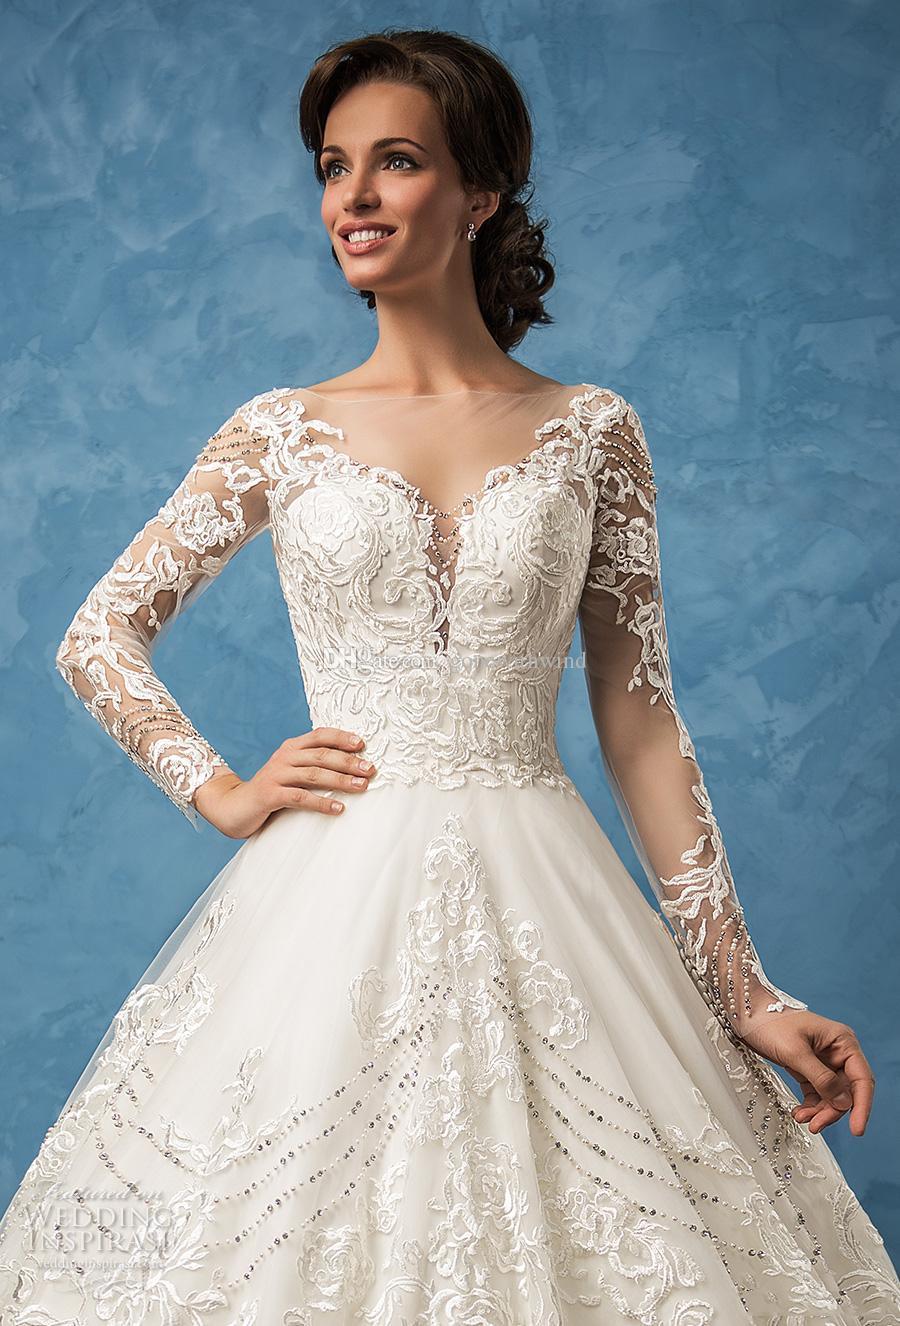 long sleeve vintage wedding dresses 2017 amelia sposa bridal ...